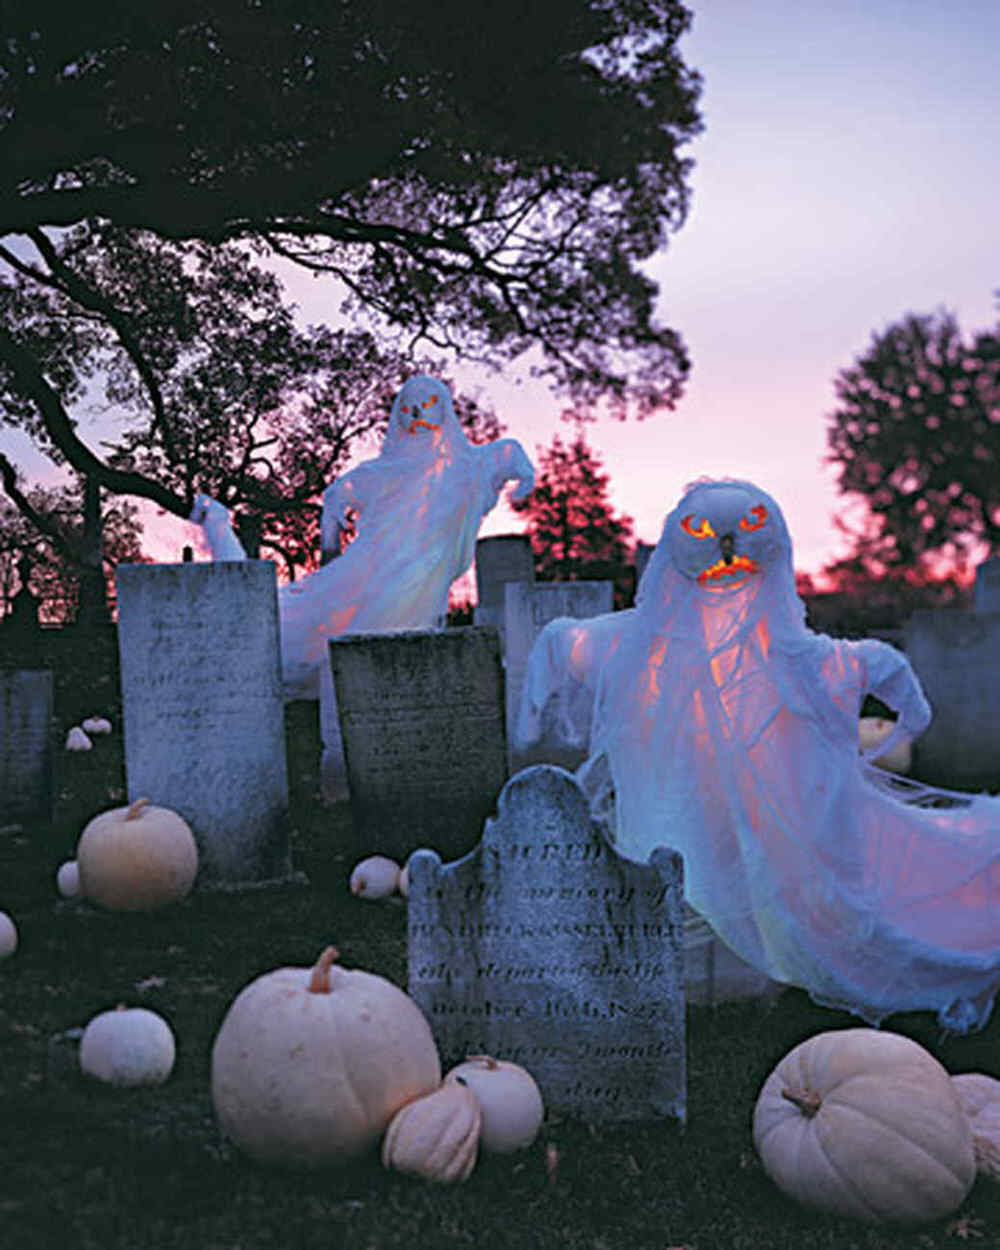 How To Make A DIY Halloween Graveyard! • The Budget Decorator